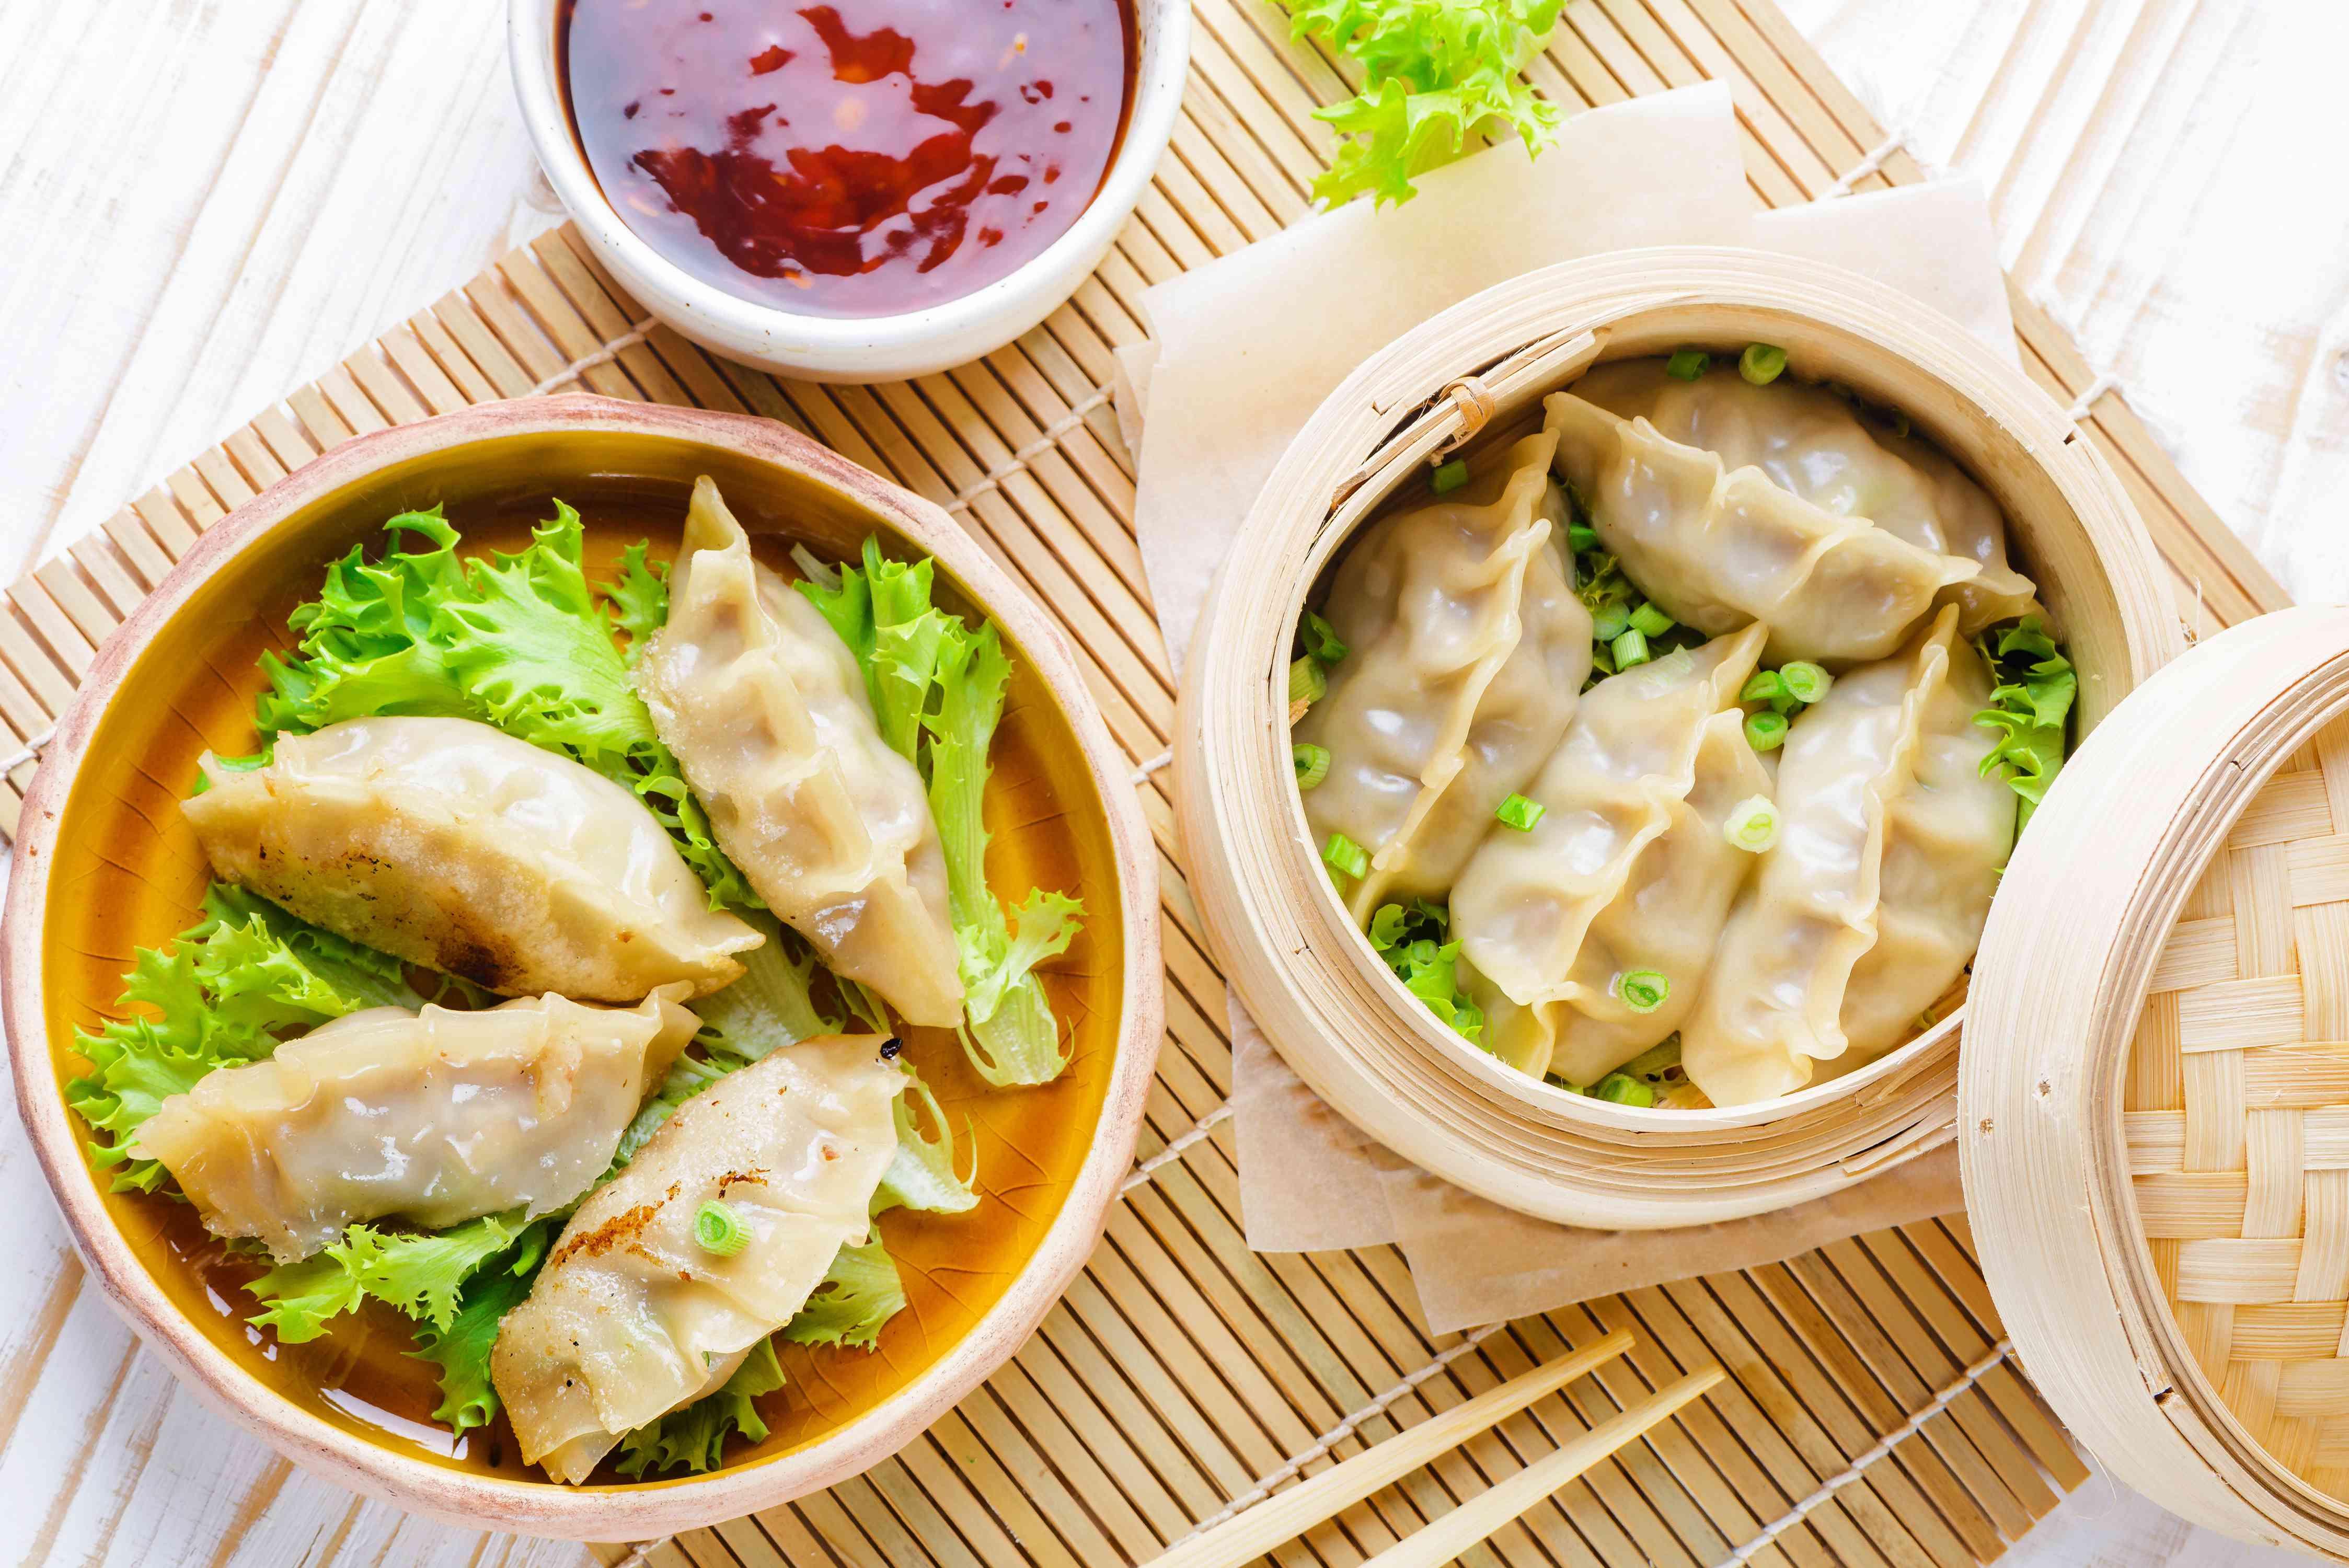 Mandoo (Korean dumpling) in steamer baskets